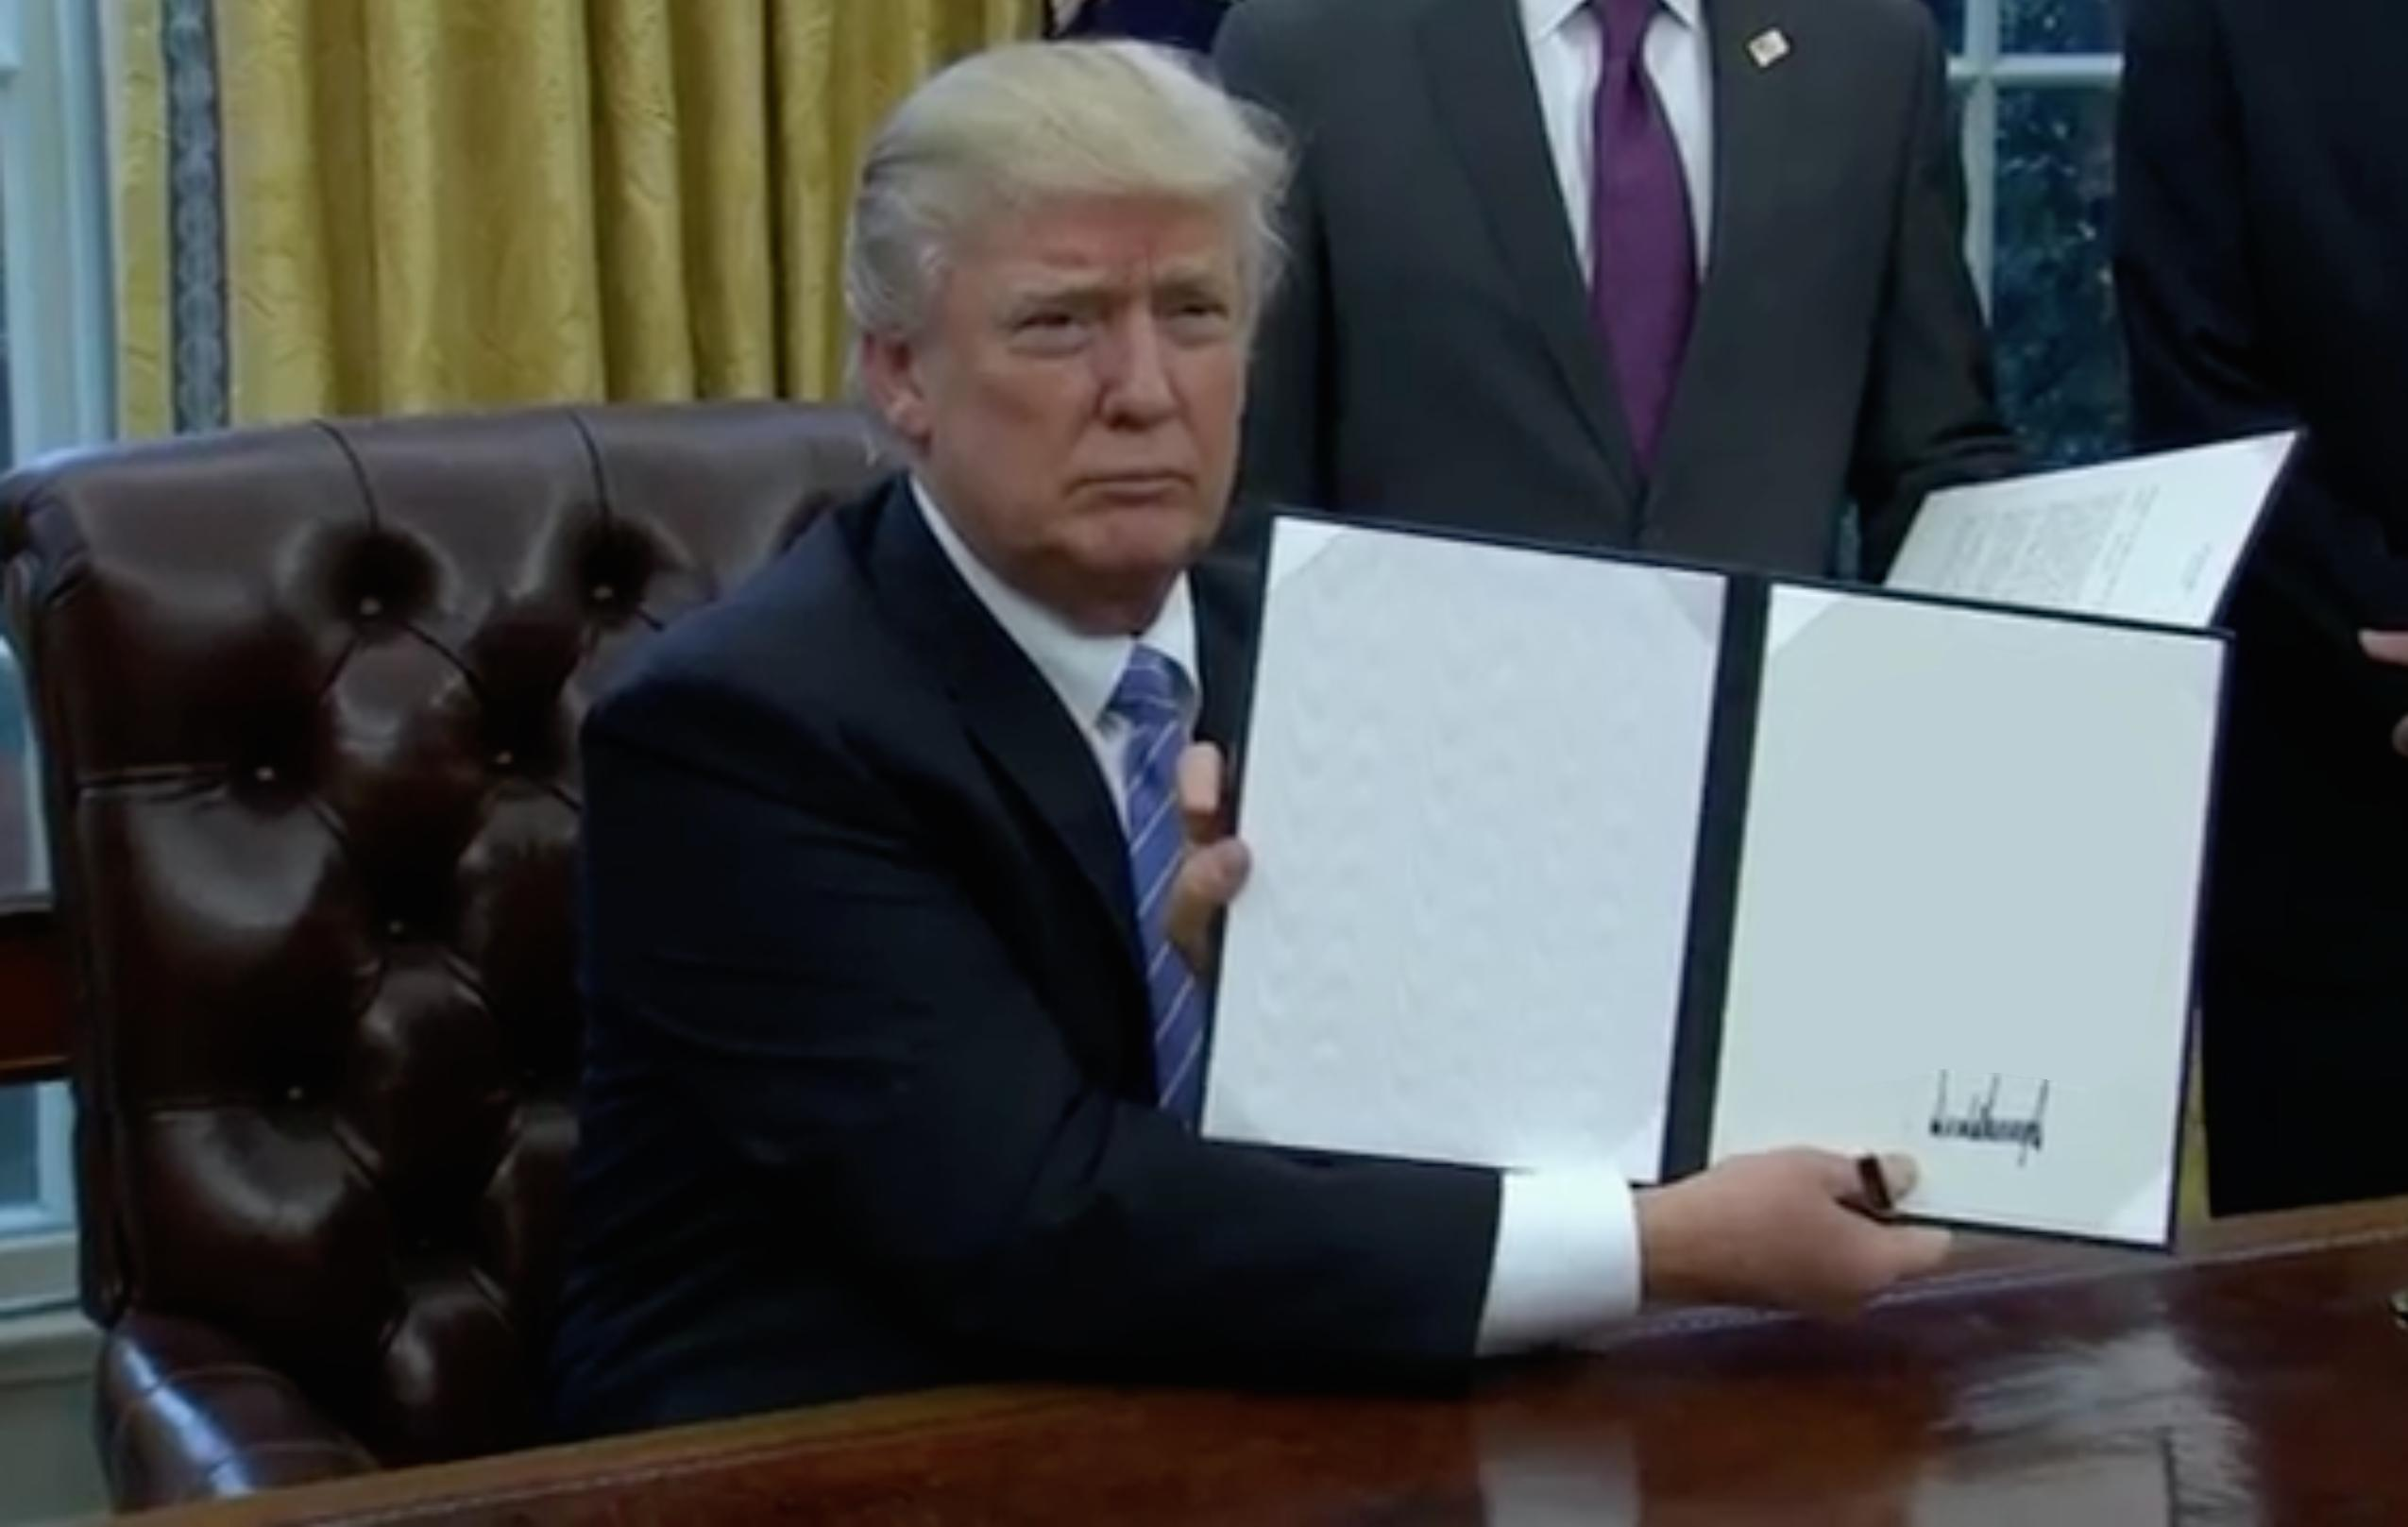 Donald trump united states of america speech official profession public speaking